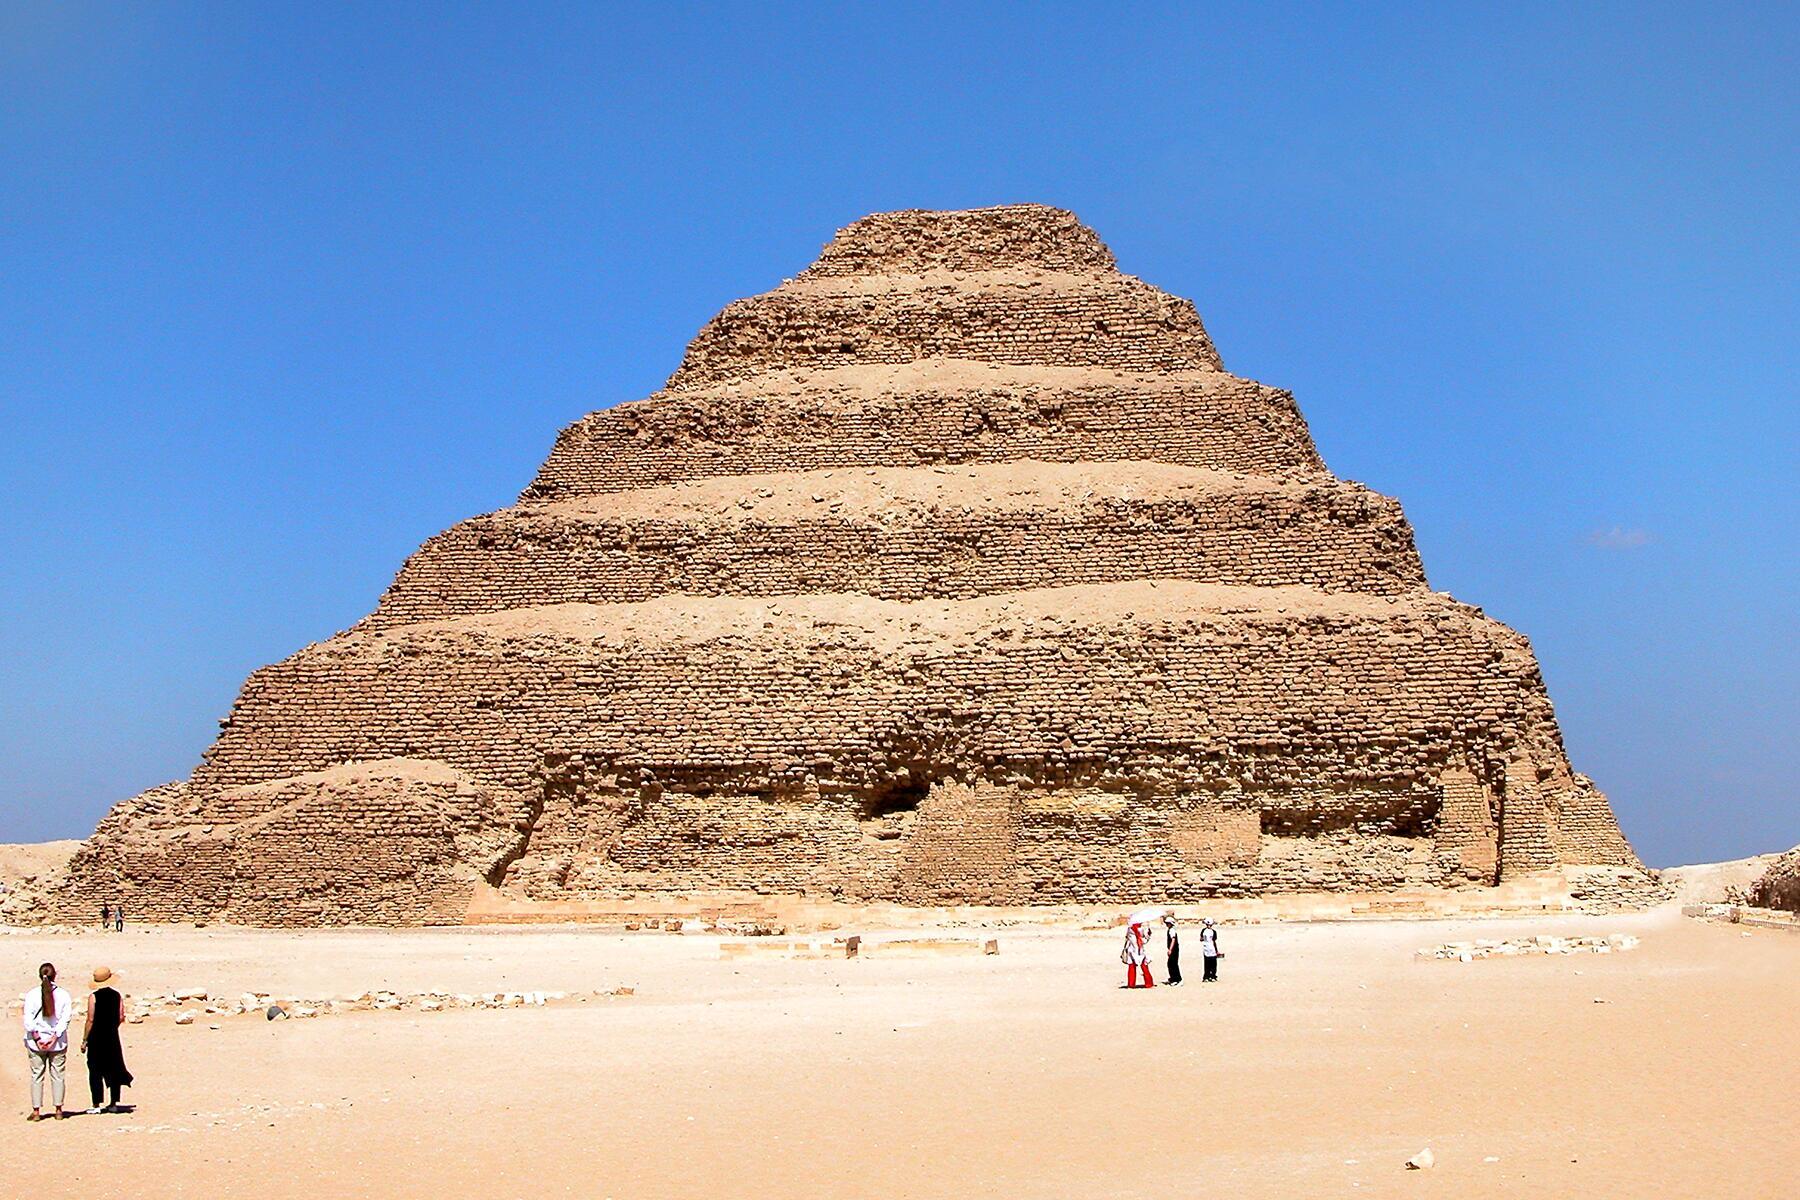 05_OldestManmadeStructure__PyramidofDjoser_5.) Egypt-12B-021_-_Step_Pyramid_of_Djoser